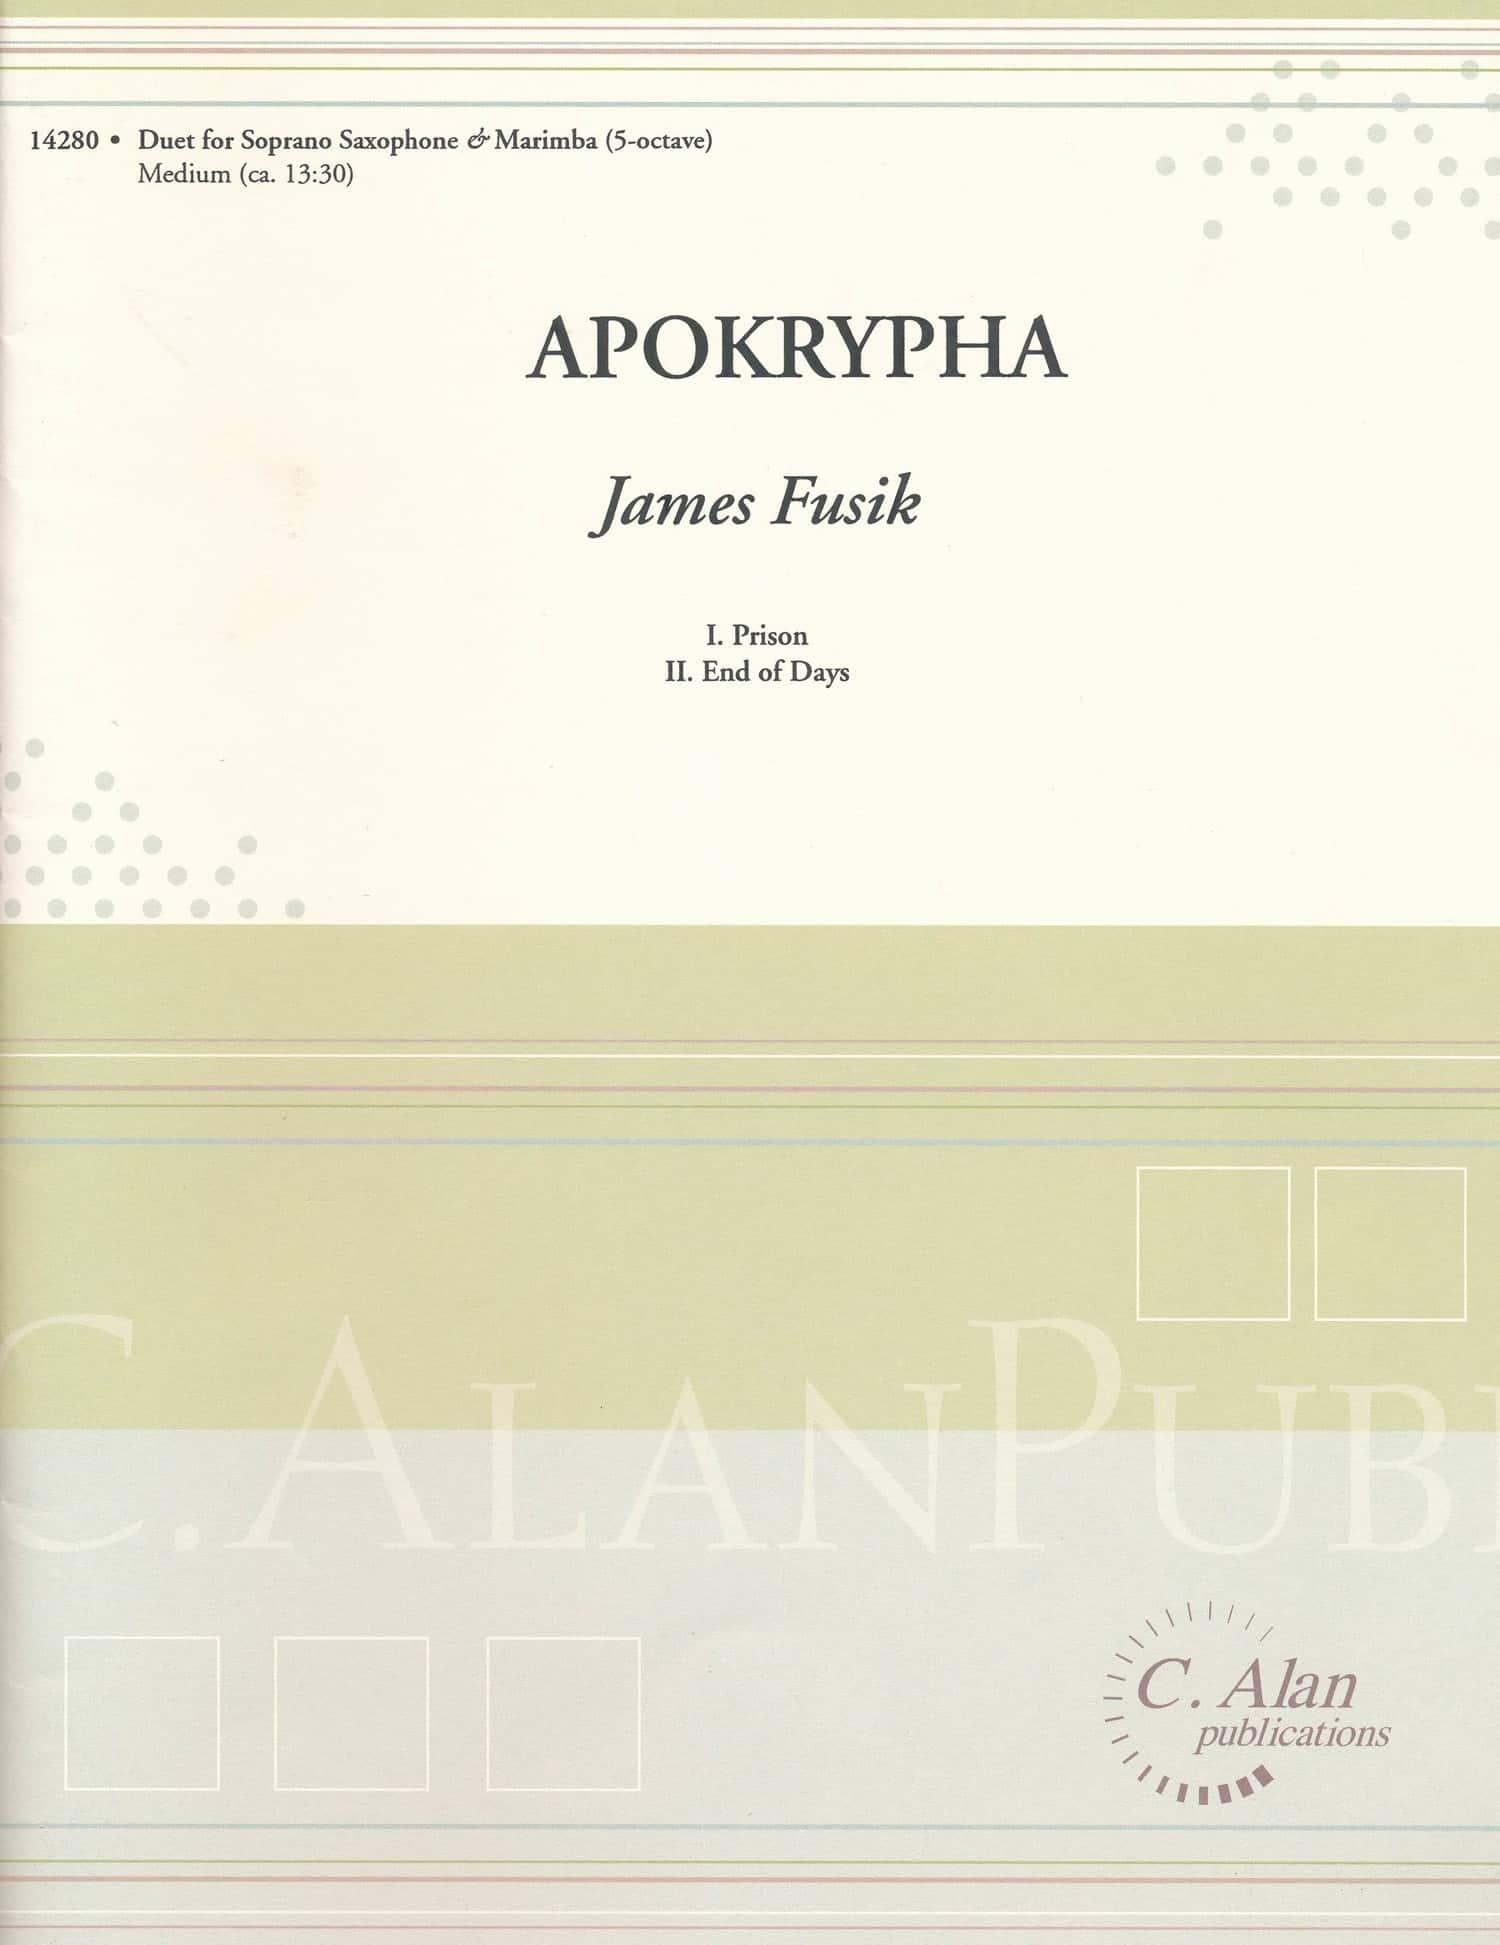 Apokrypha by James Fusik